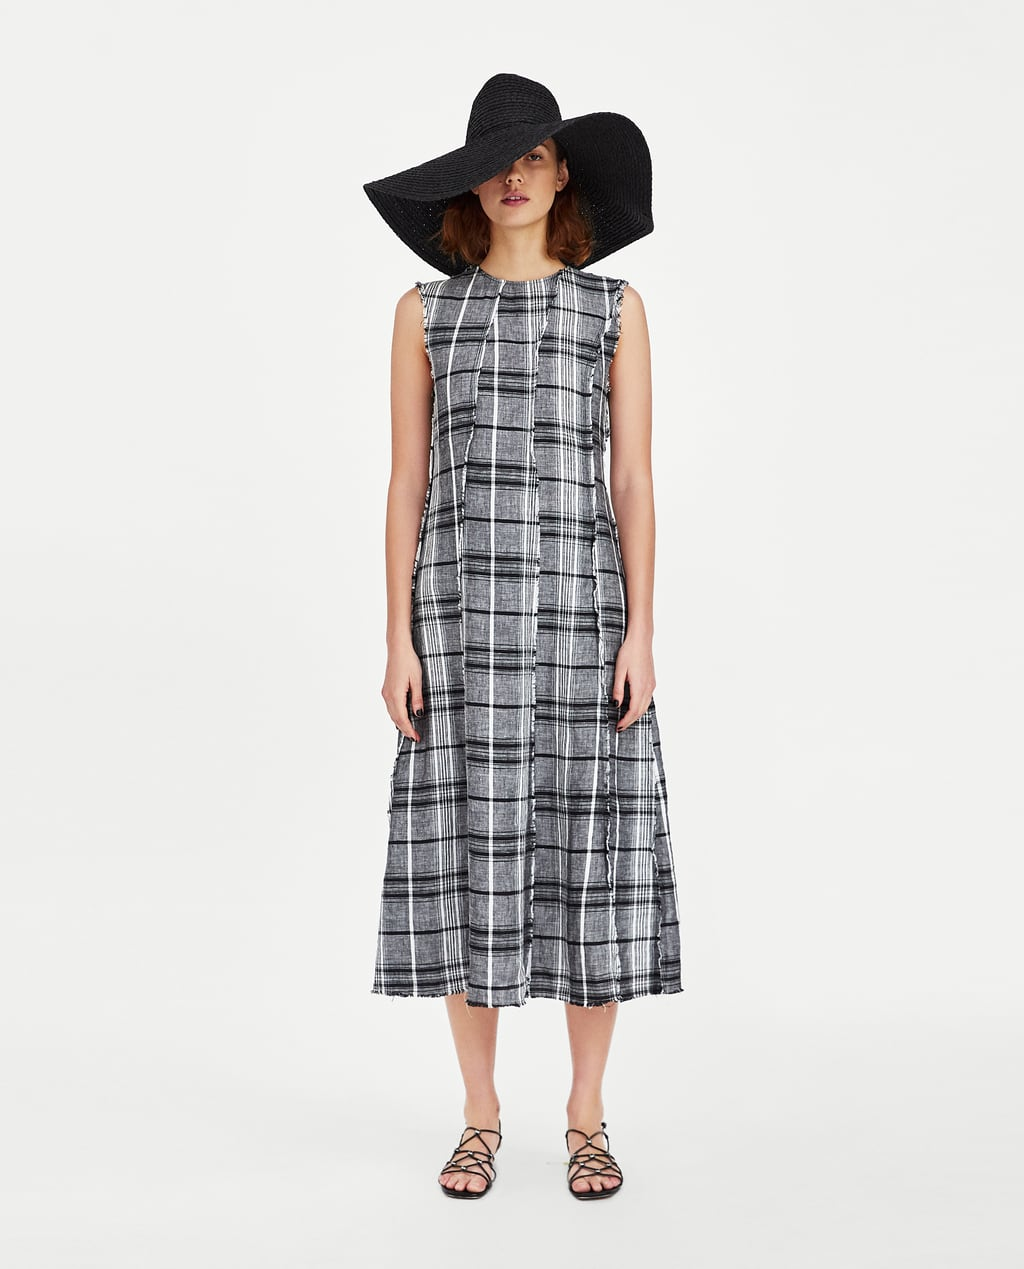 ZARA - Dress £39.99